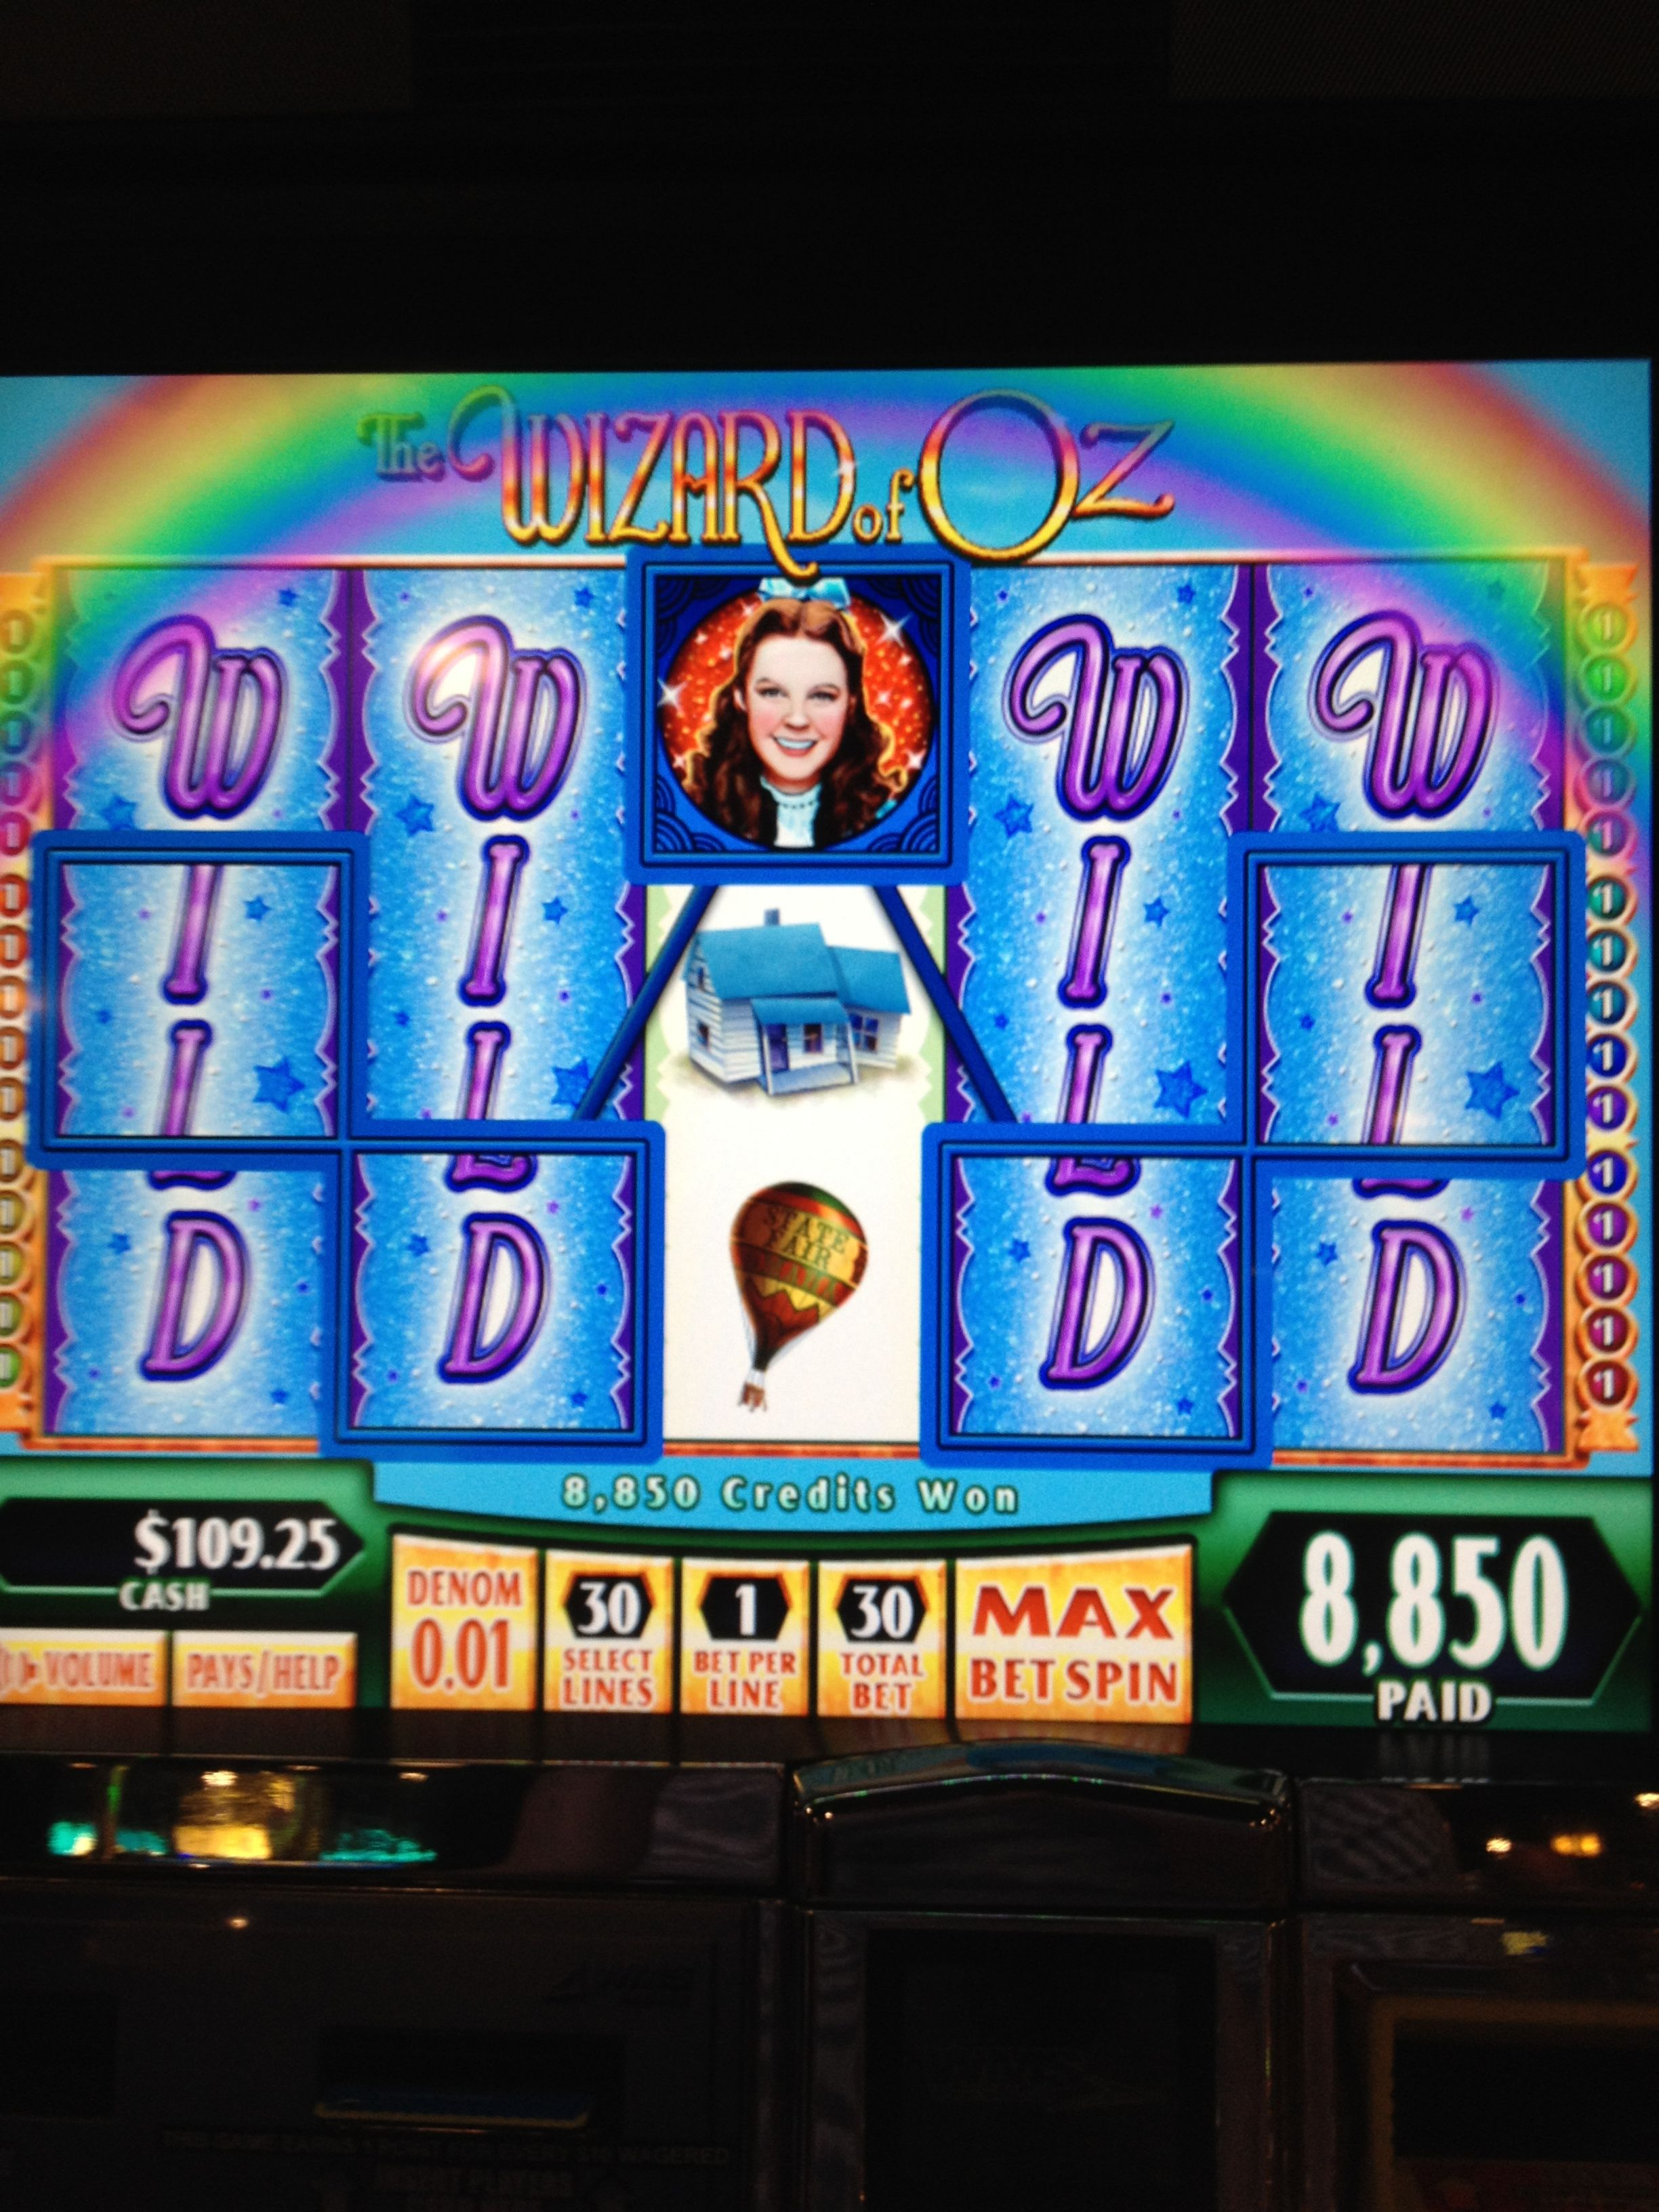 Jaws slot machine las vegas michigan indian casino gambling age